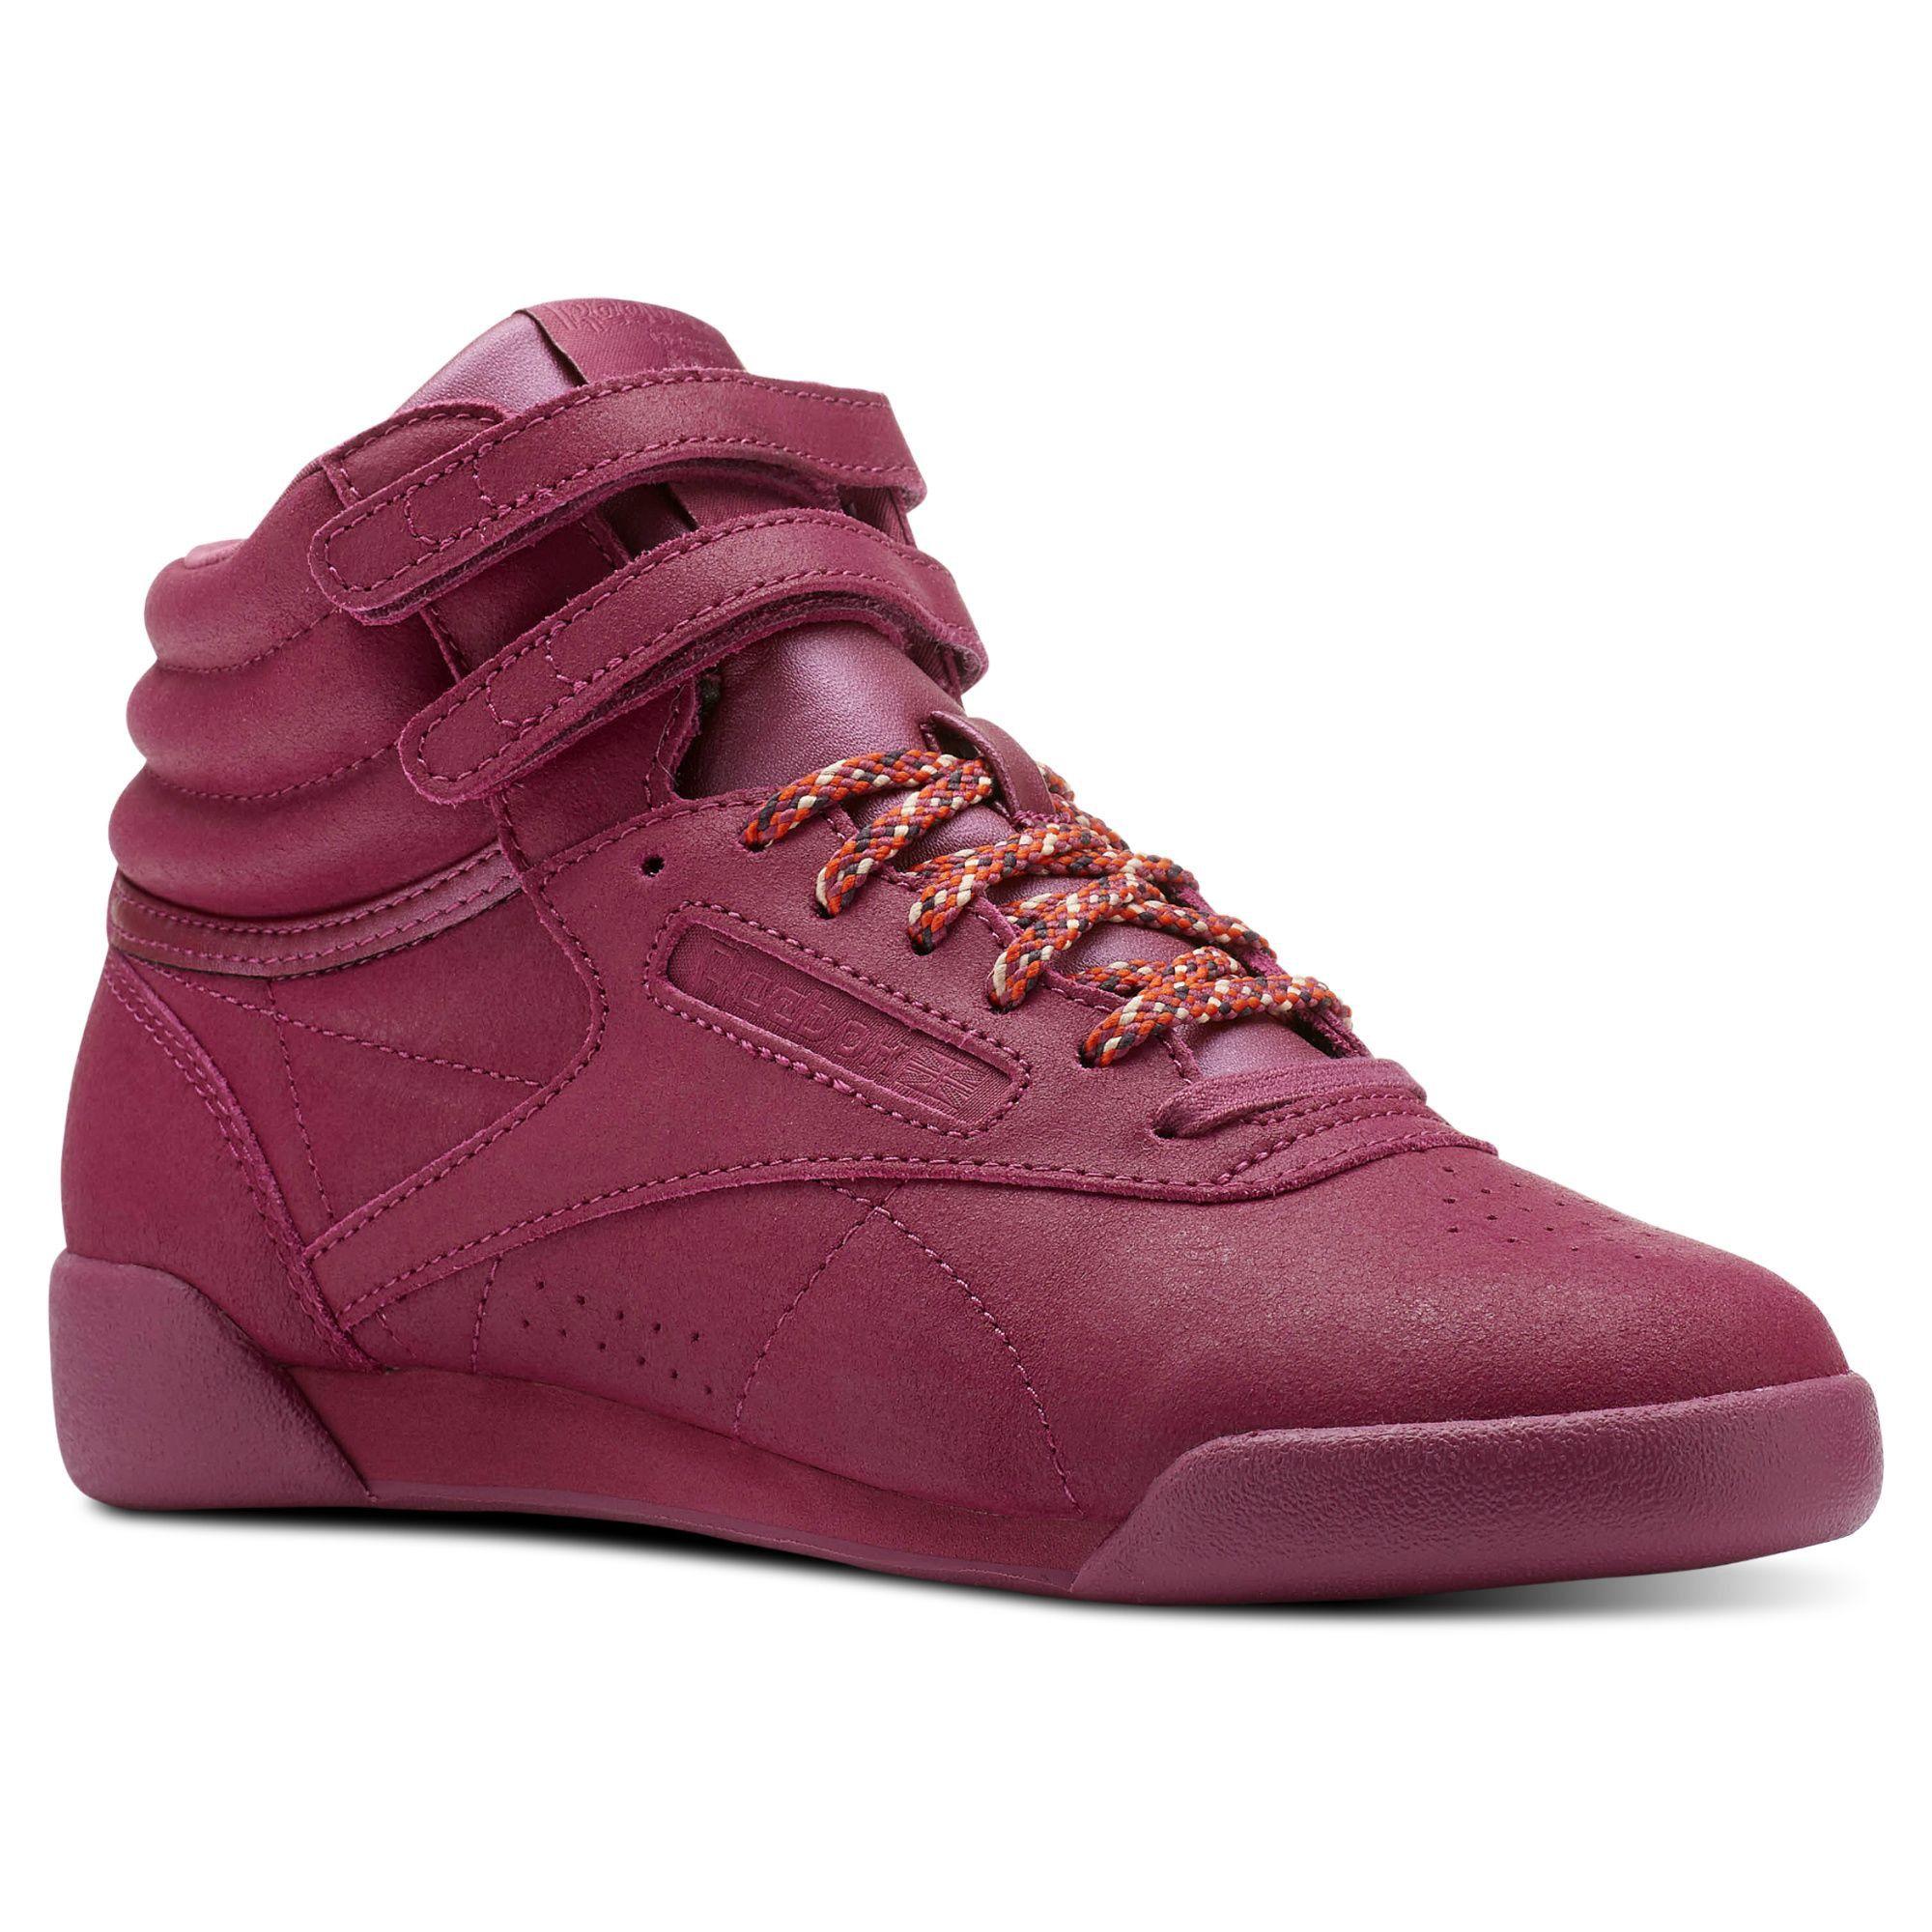 Reebok Freestyle Hi 6 5 Reebok Freestyle Girls Shoes Girls Shoes Kids